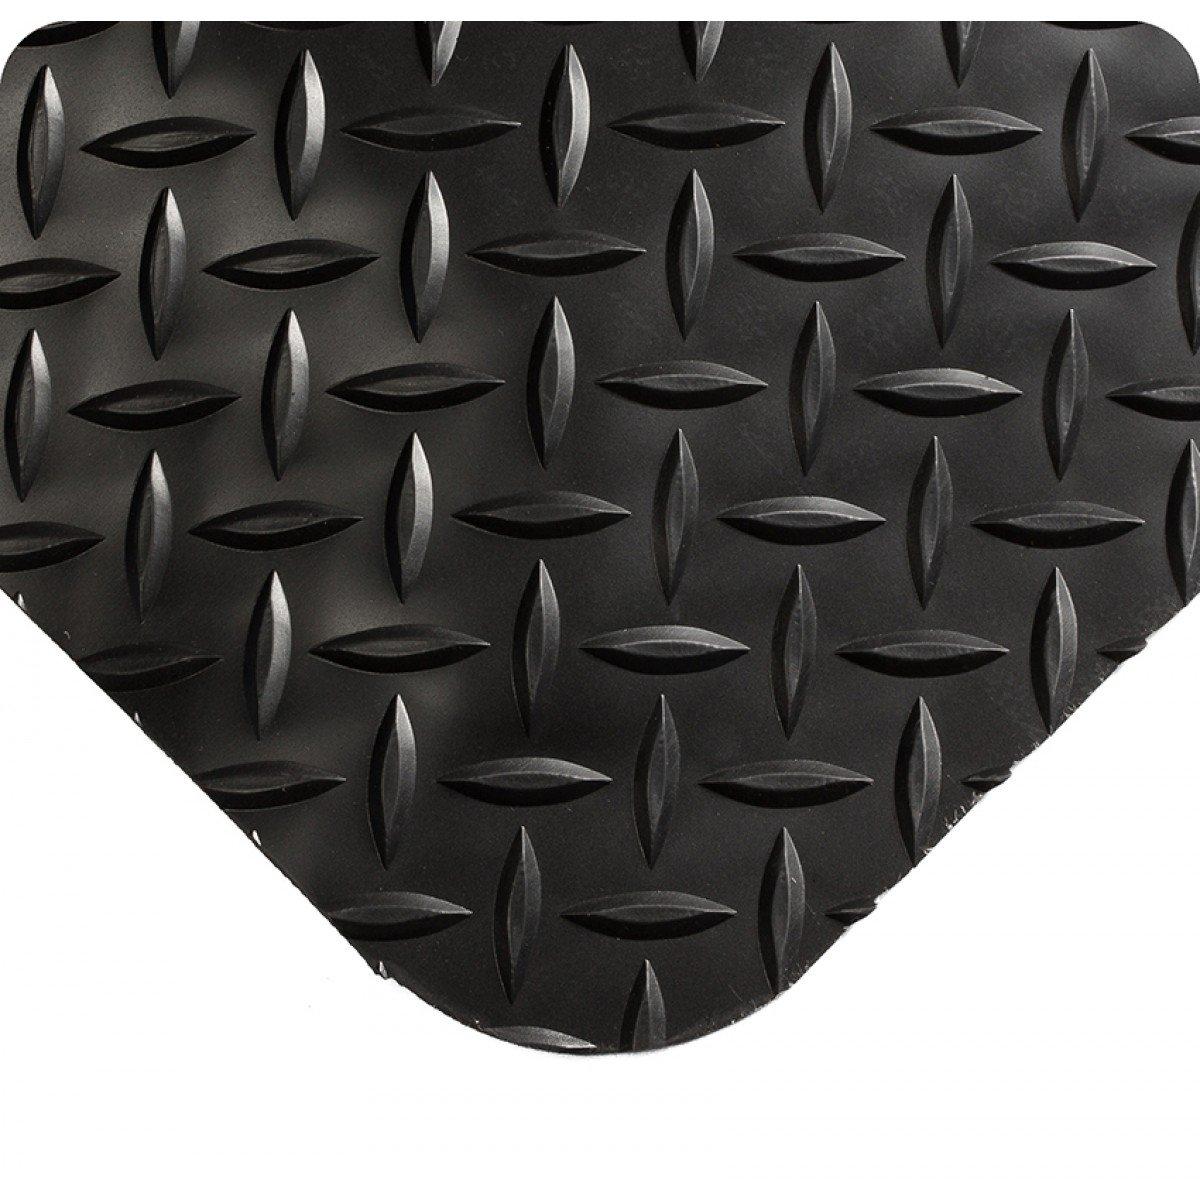 Wearwell 495.916x2x4BK Diamond-Plate 正規逆輸入品 Select Mat 4' 登場大人気アイテム Length 2' x